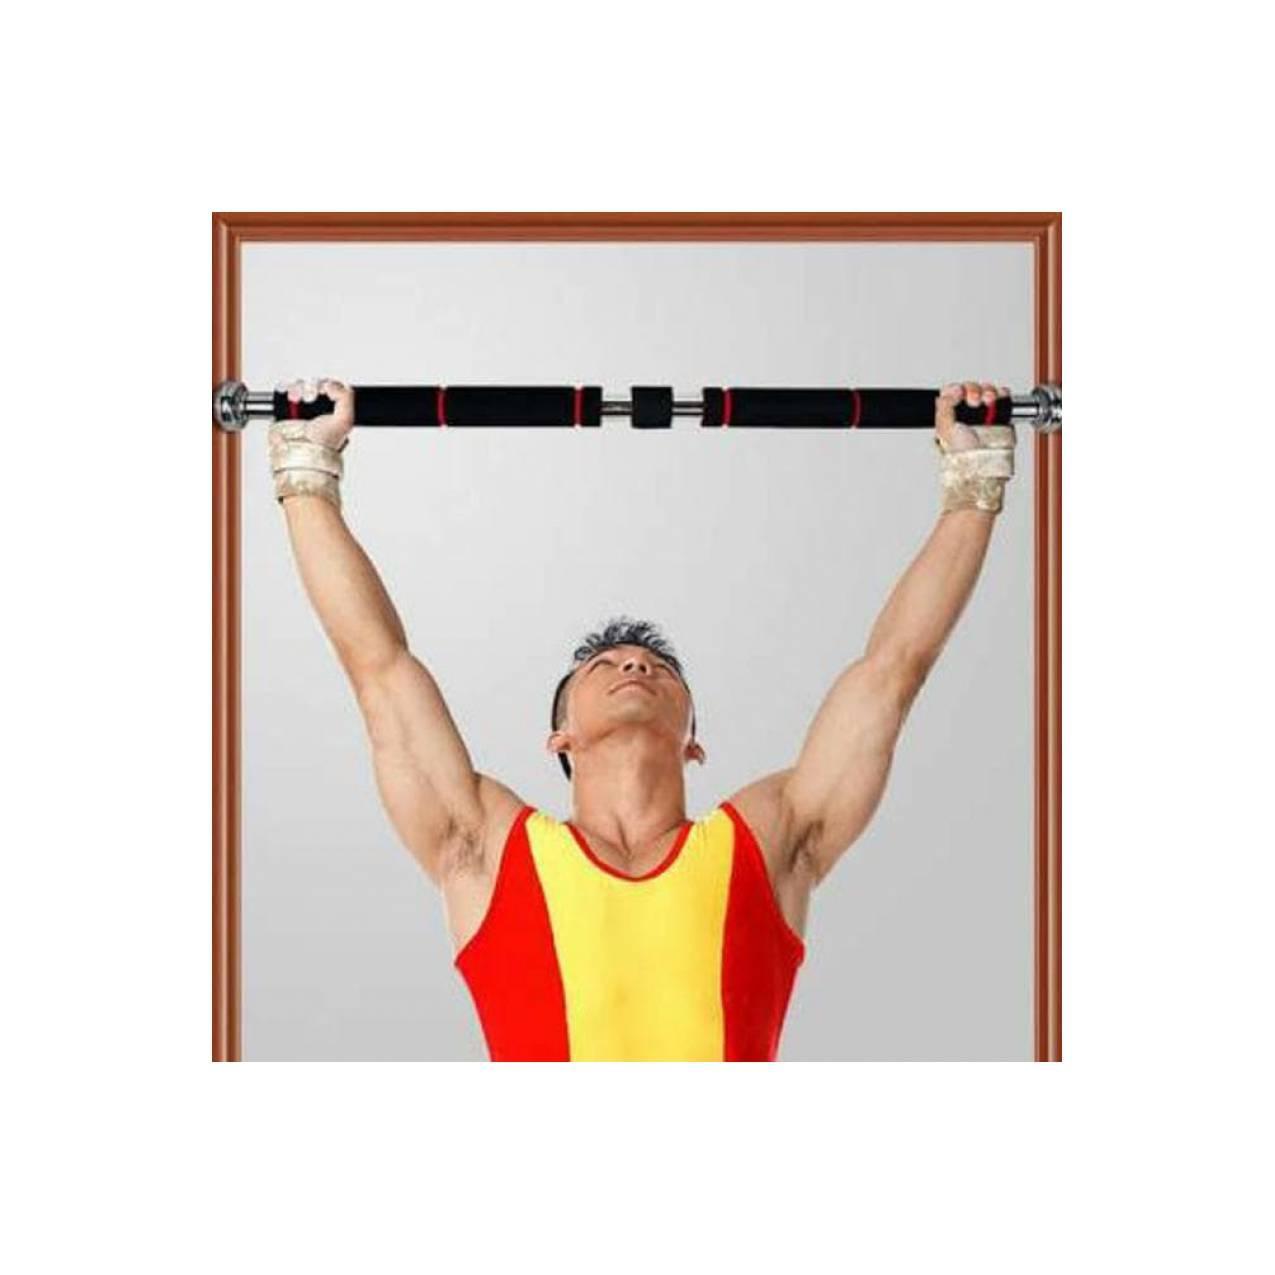 Harga Gila-Gilaan Premium Door Pull Up Bar / Tiang Chinning Chin Up